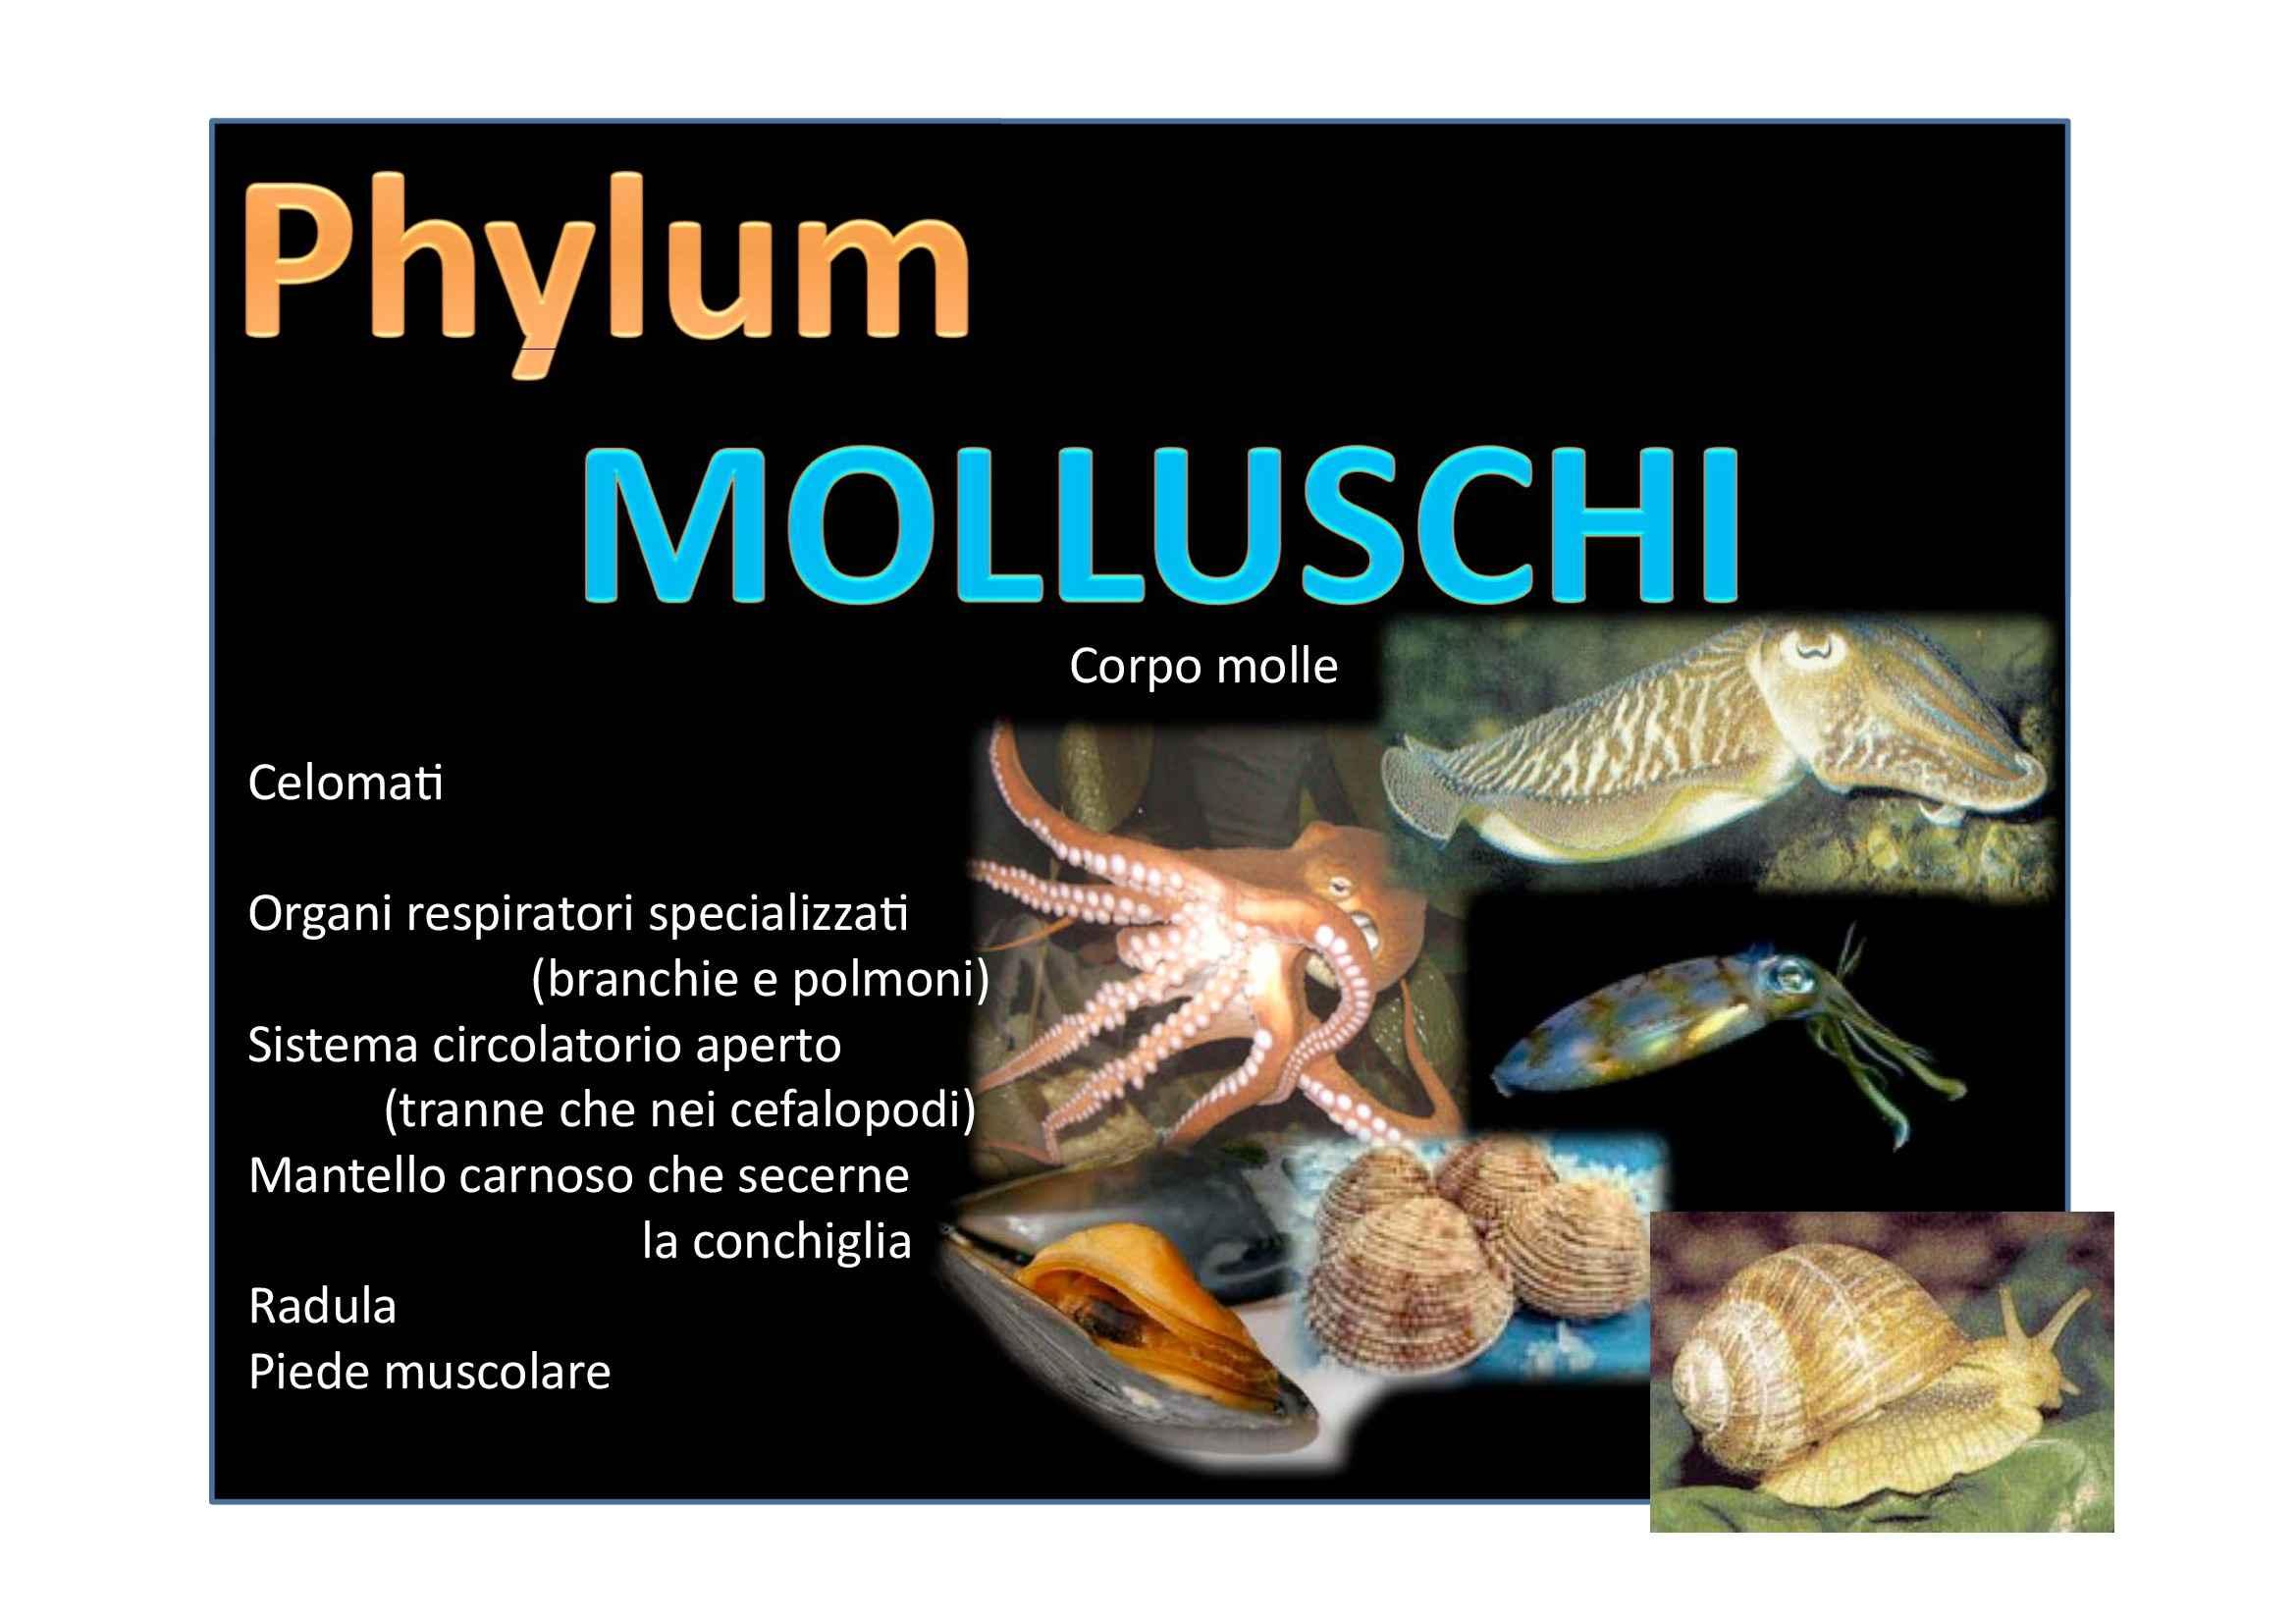 Molluschi, Artopodi ed Echinodermi